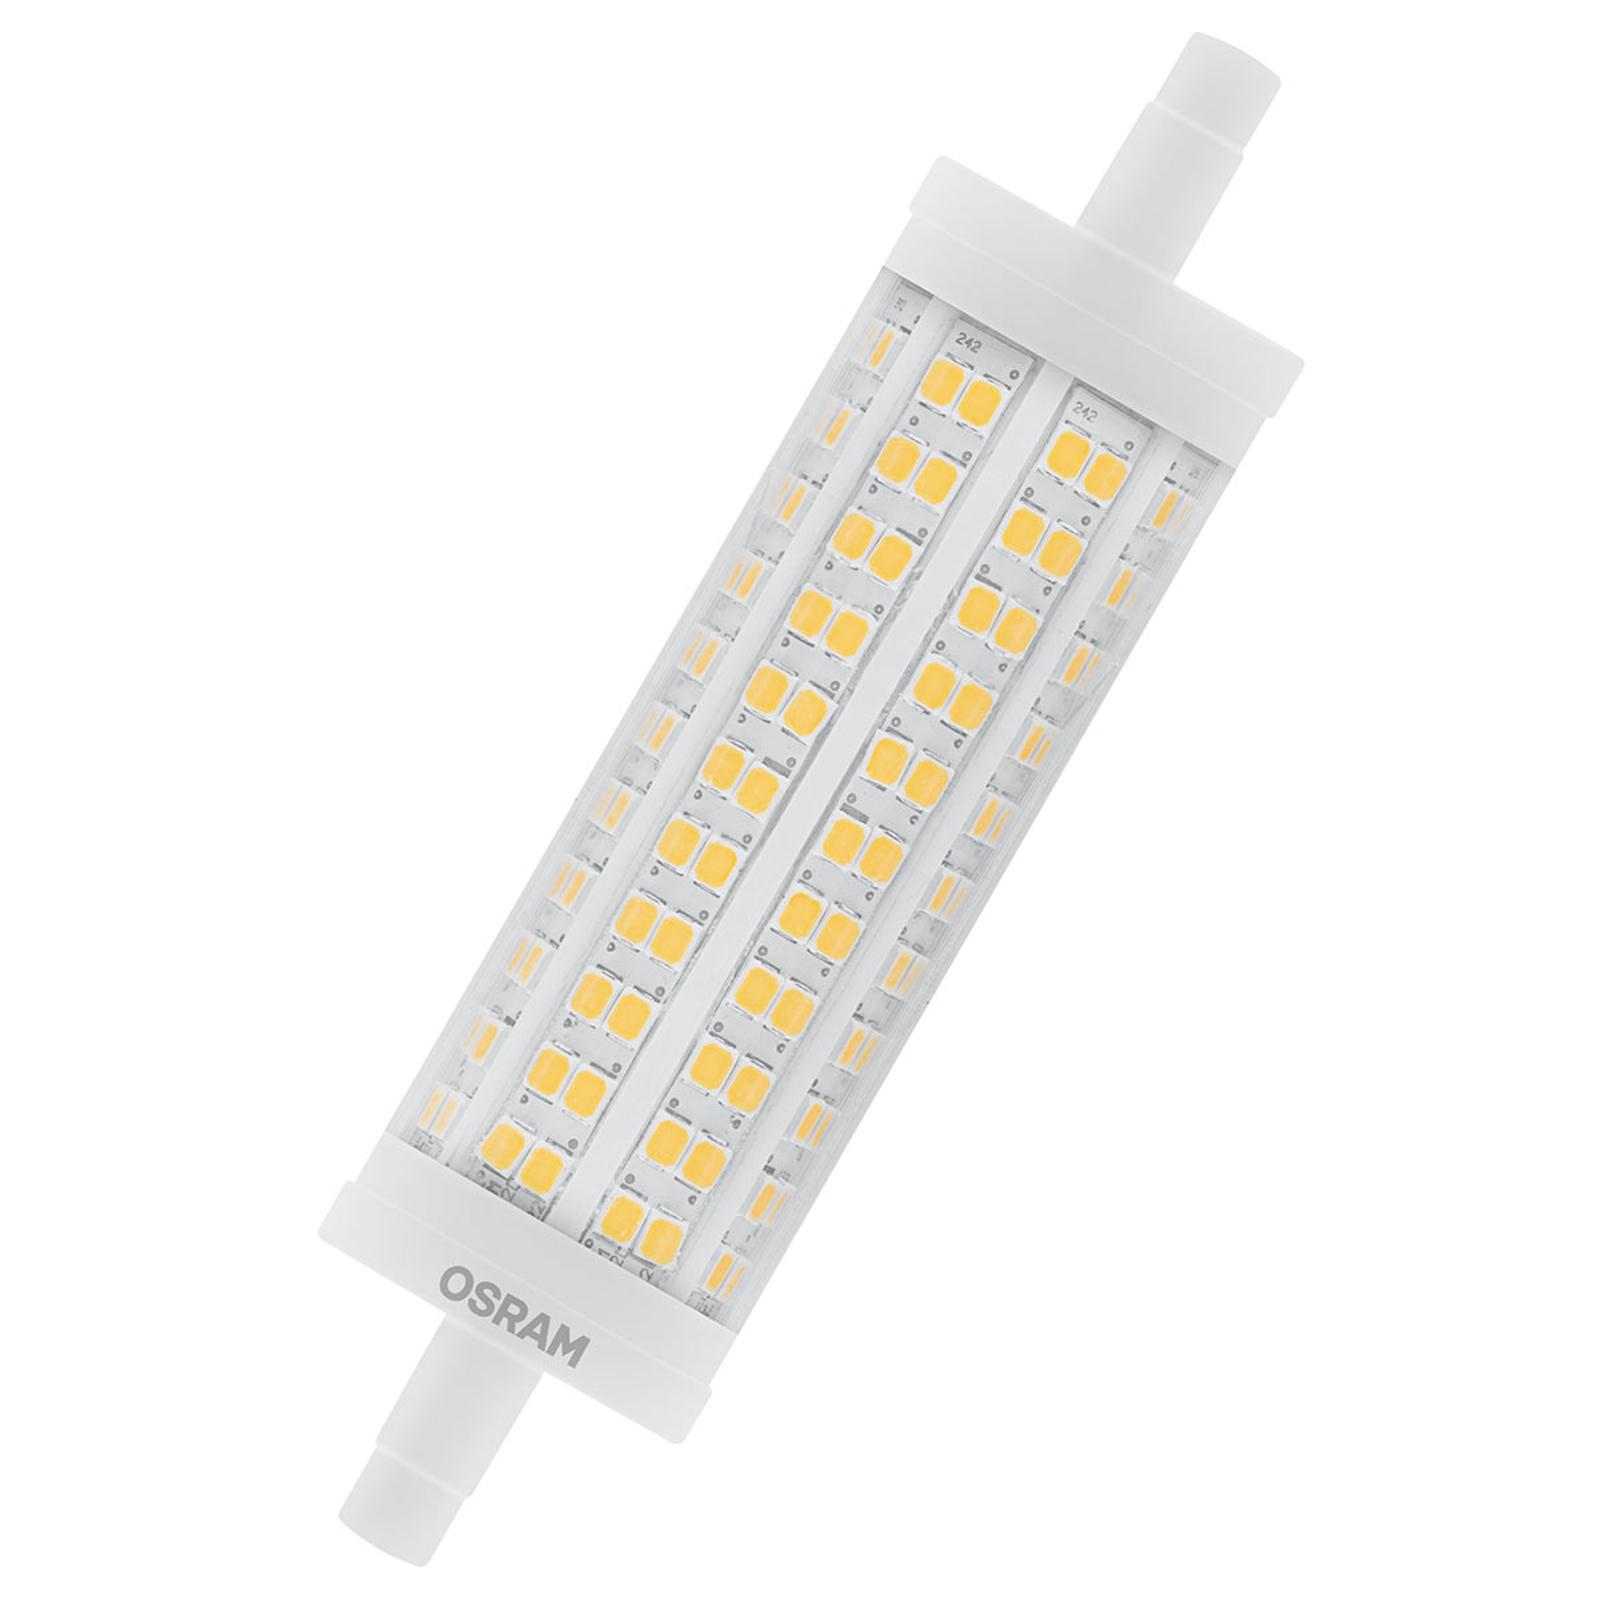 OSRAM LED-stav R7s 17,5 W varmhvit 2452 lm